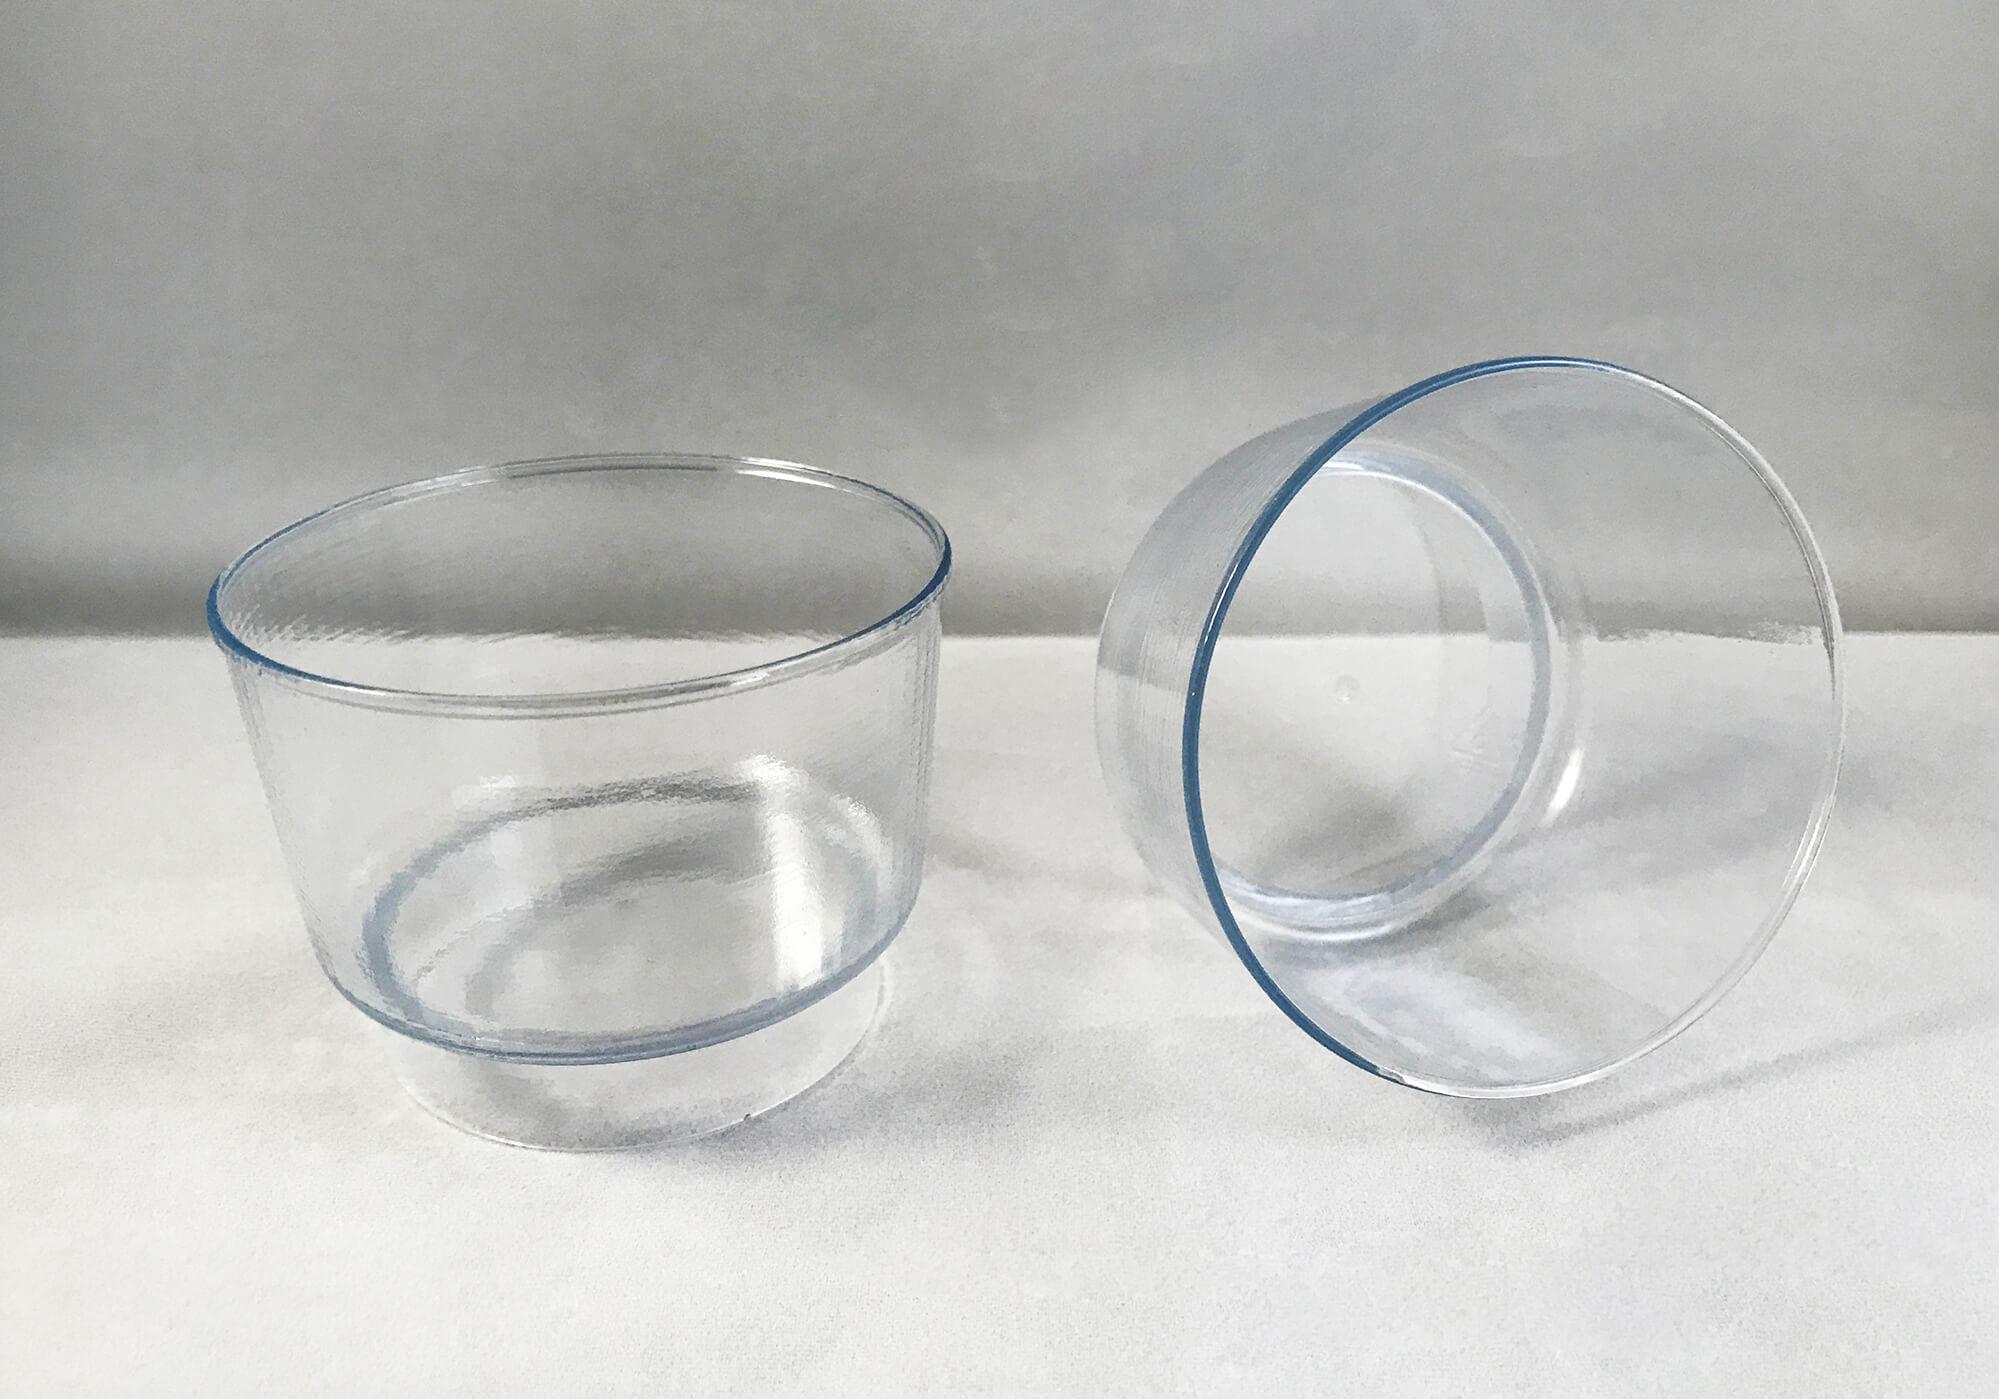 SLA: Semi-Clear Material